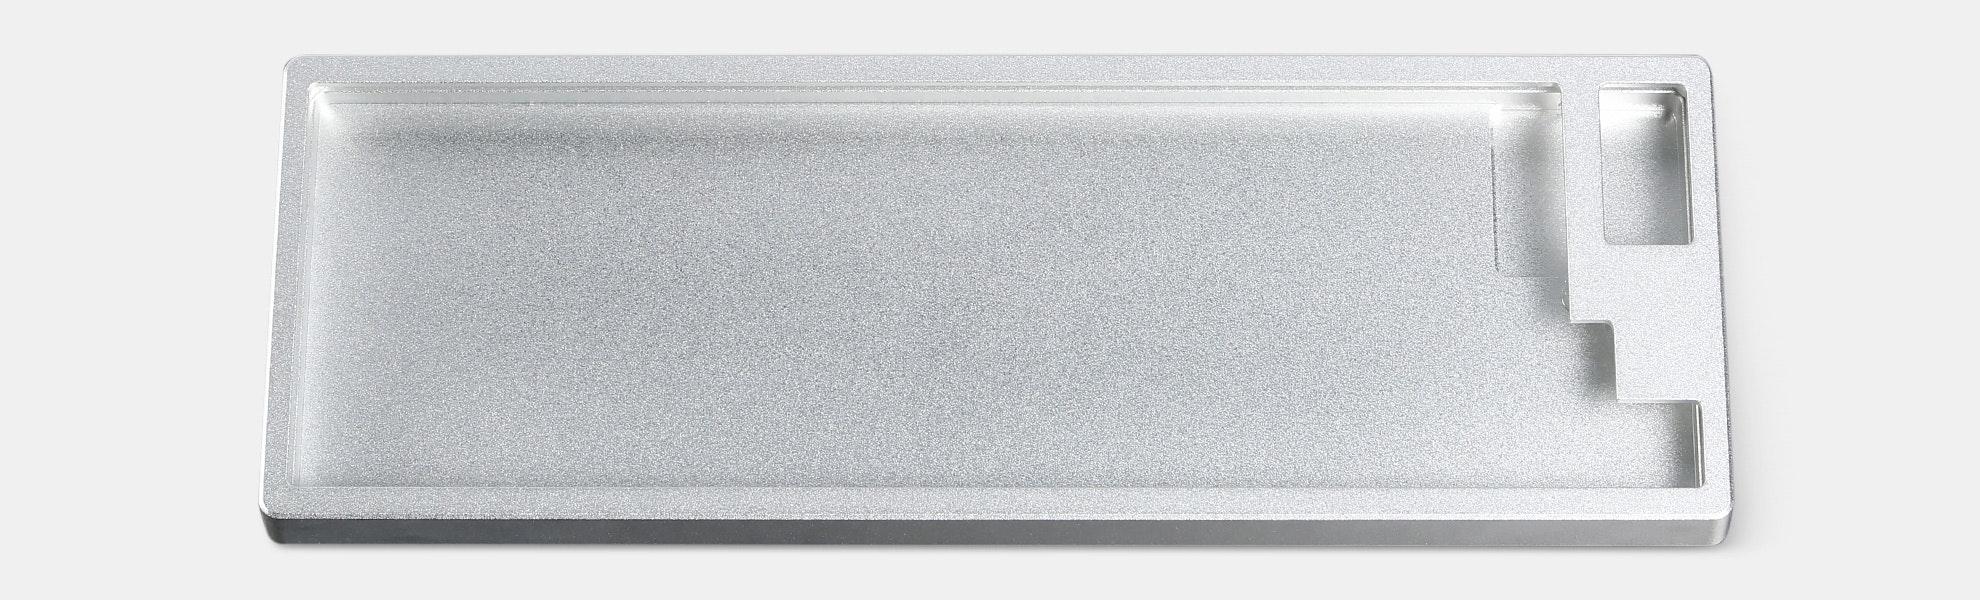 Aluminum Case For Leopold FC660M